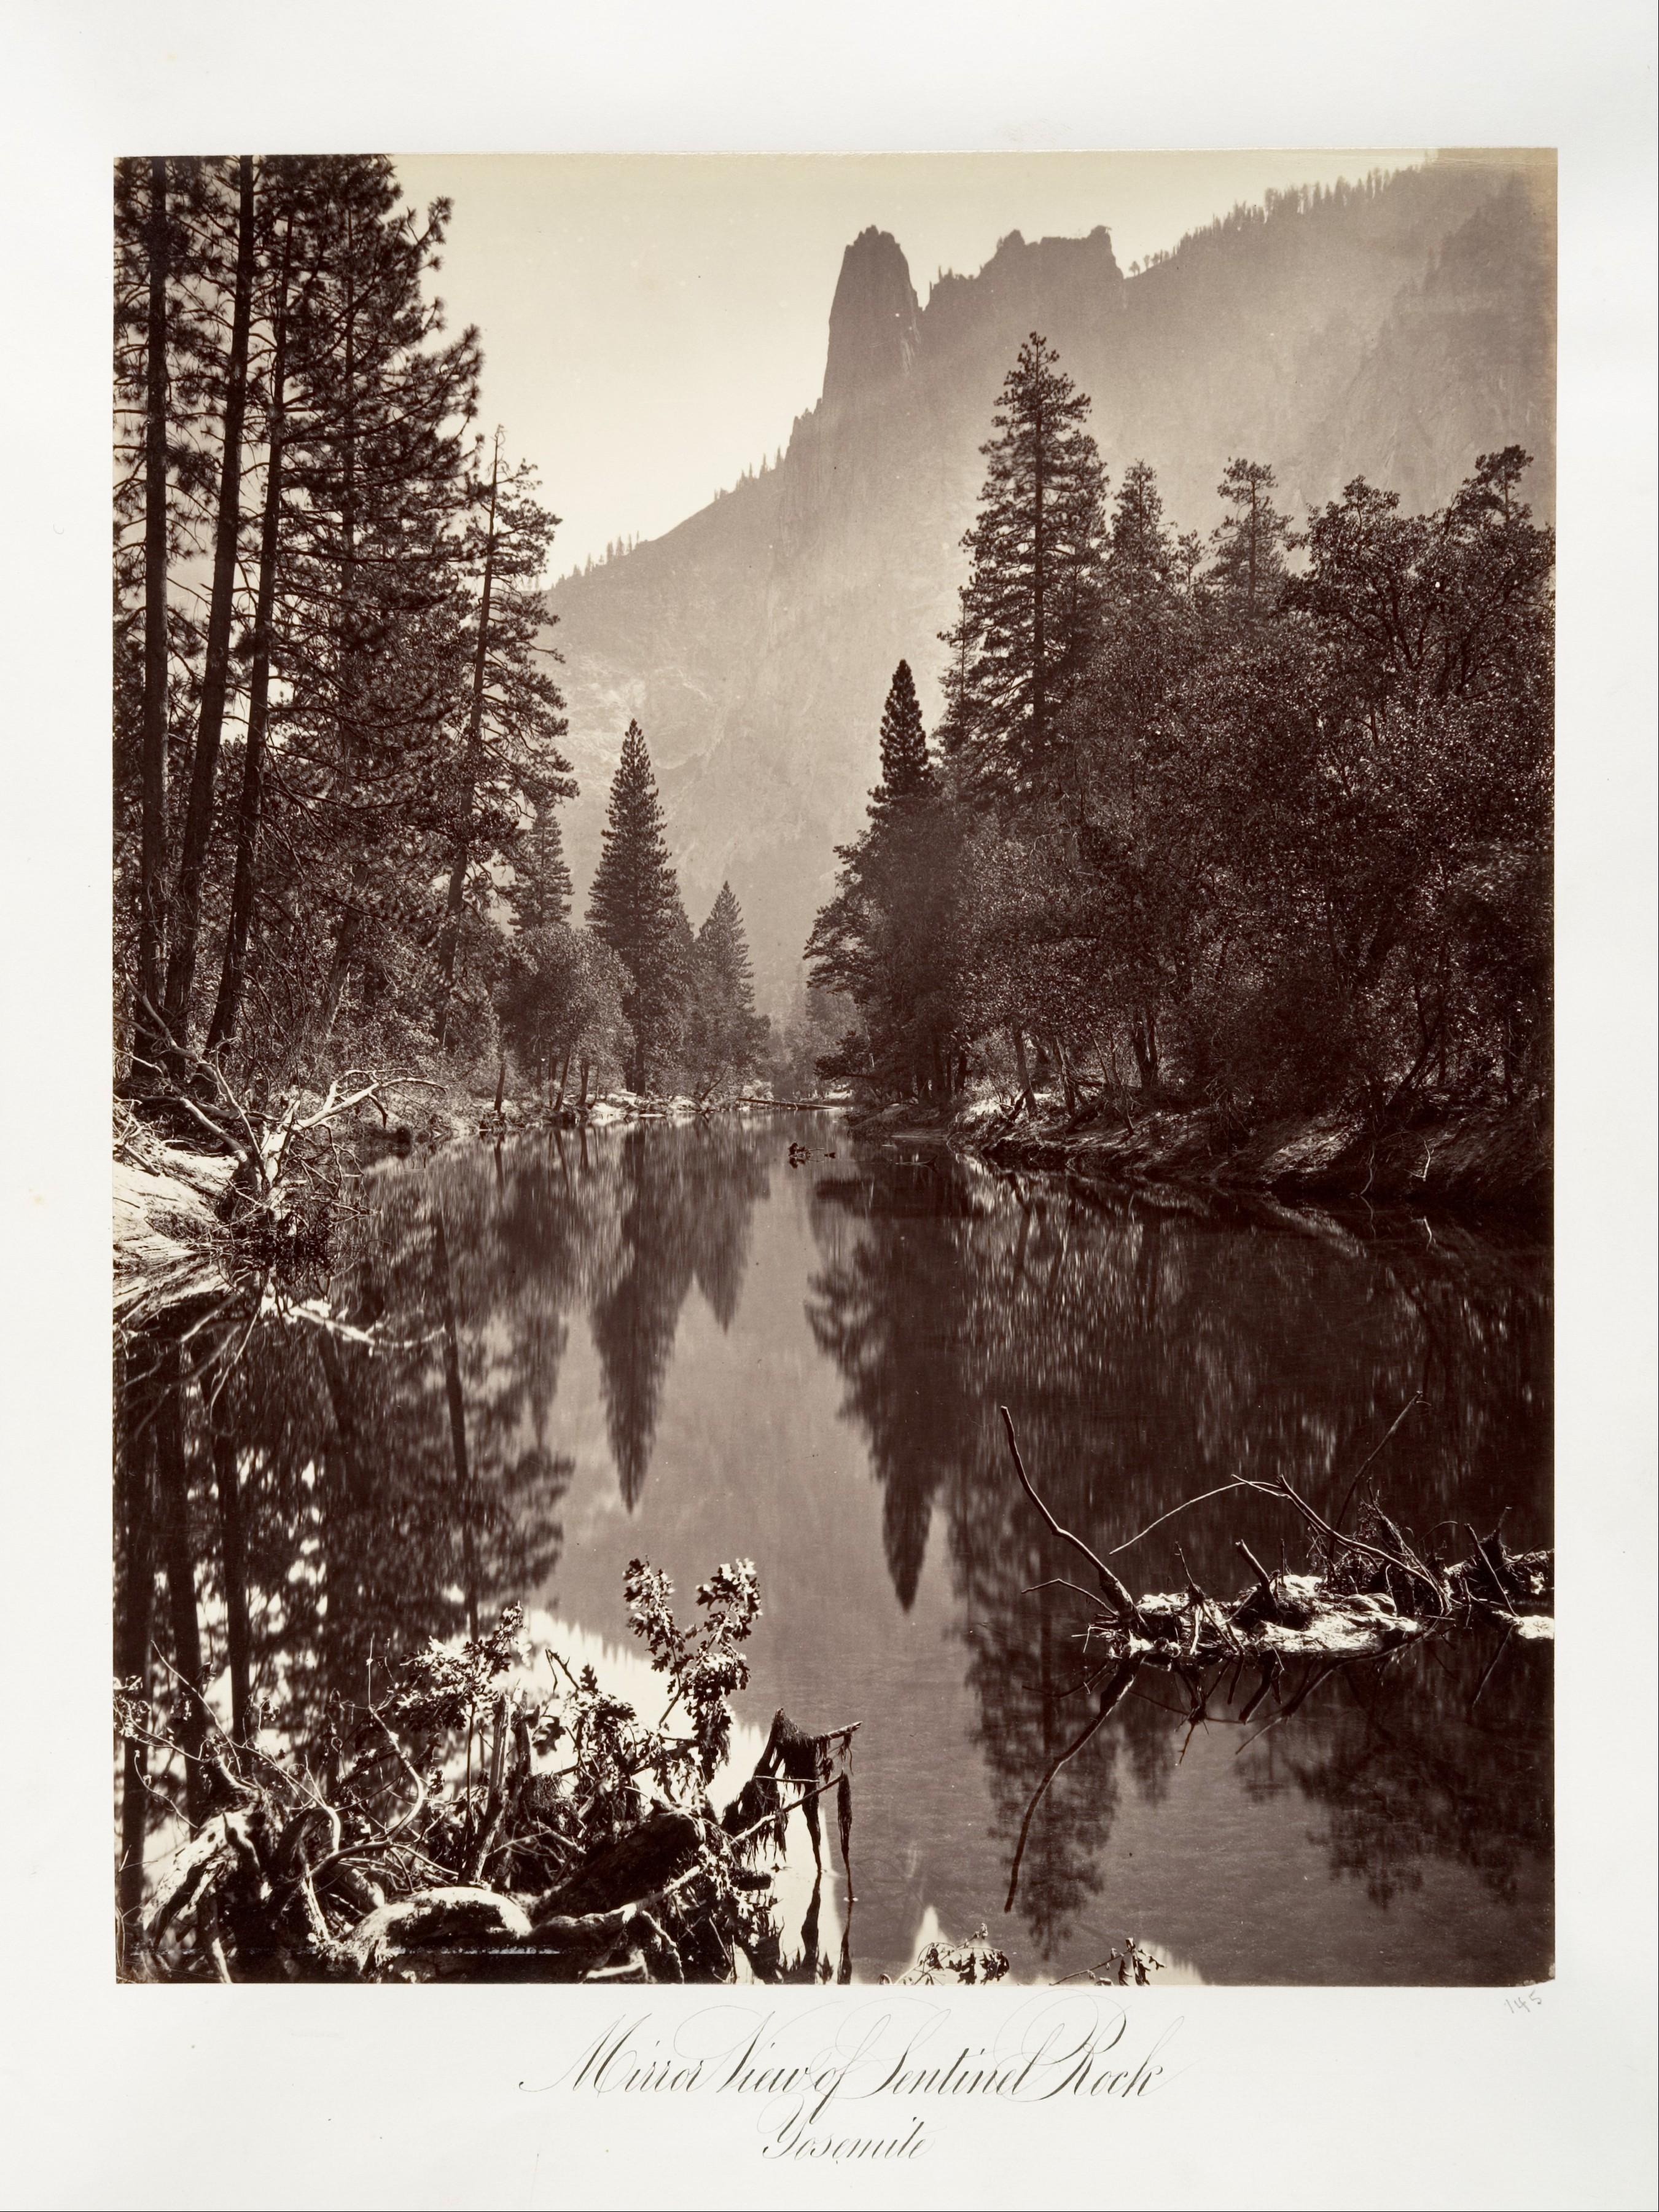 Fotó: Carleton Watkins: Mirror View of Sentinel Rock, Yosemite, ca. 1872, printed ca. 1876 © Carleton Watkins / The Metropolitan Museum of Art